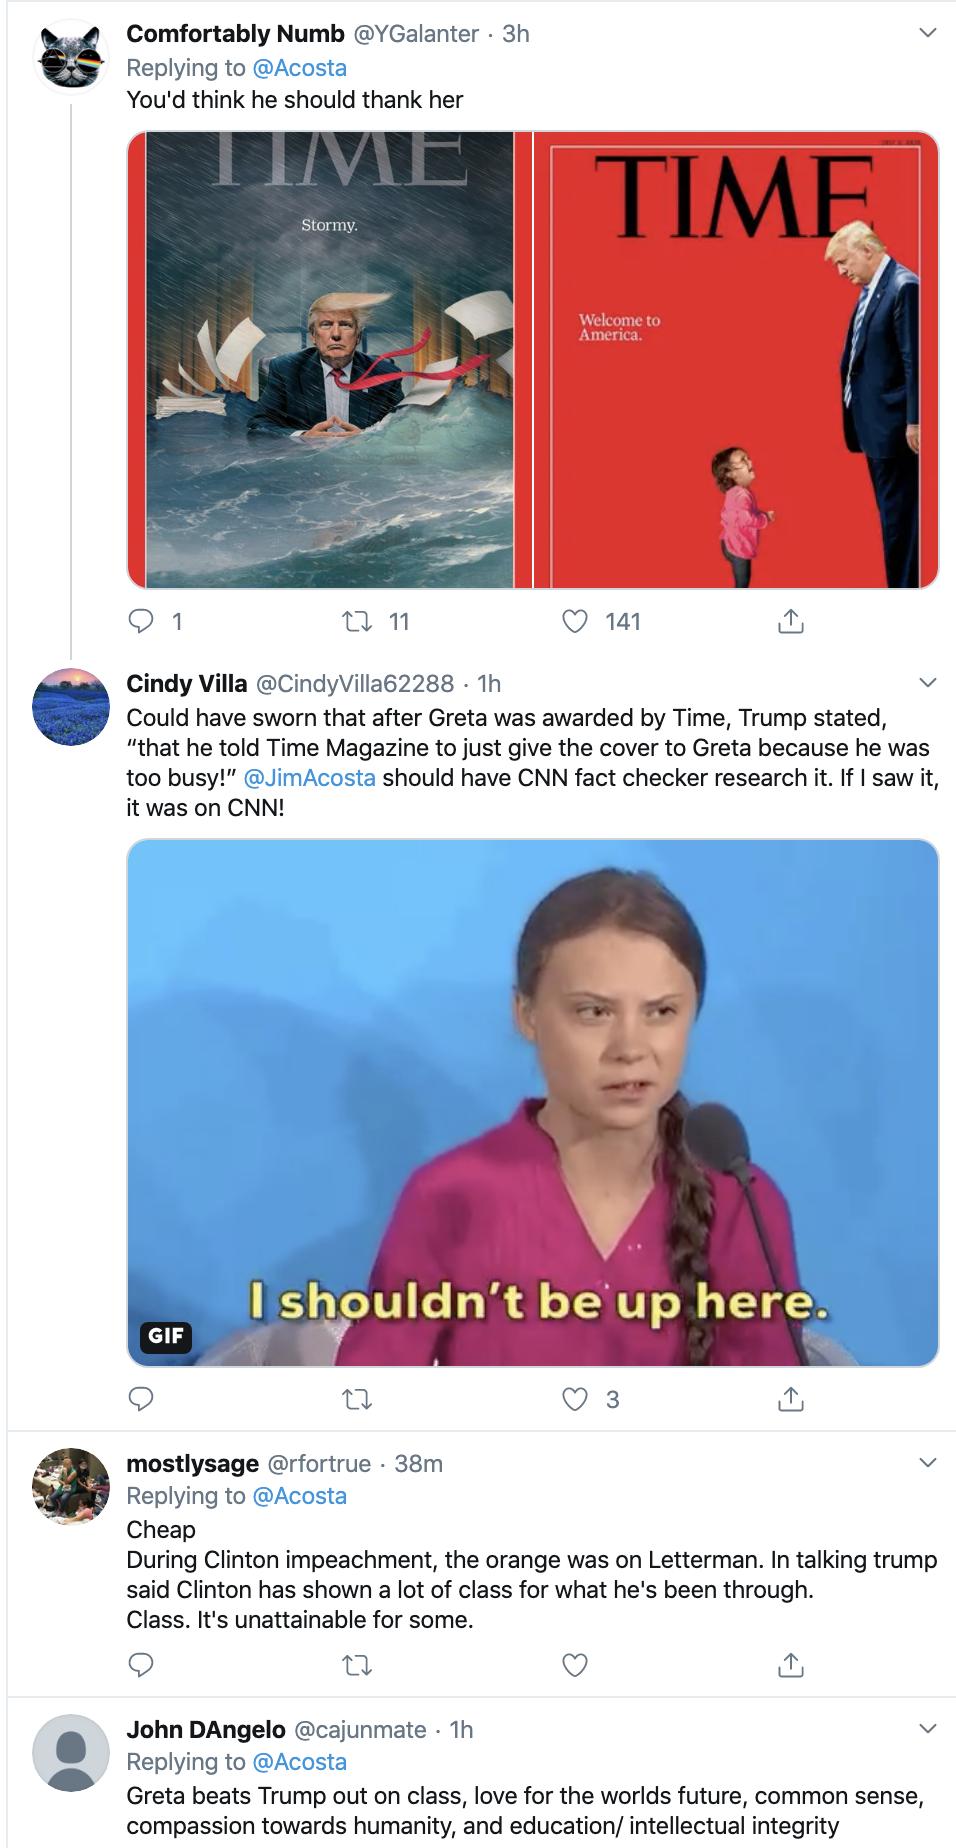 Screen-Shot-2020-01-22-at-9.29.41-AM Acosta Follows Trump In Switzerland & Publicly Trolls Him Hard Featured Impeachment Media Top Stories Twitter